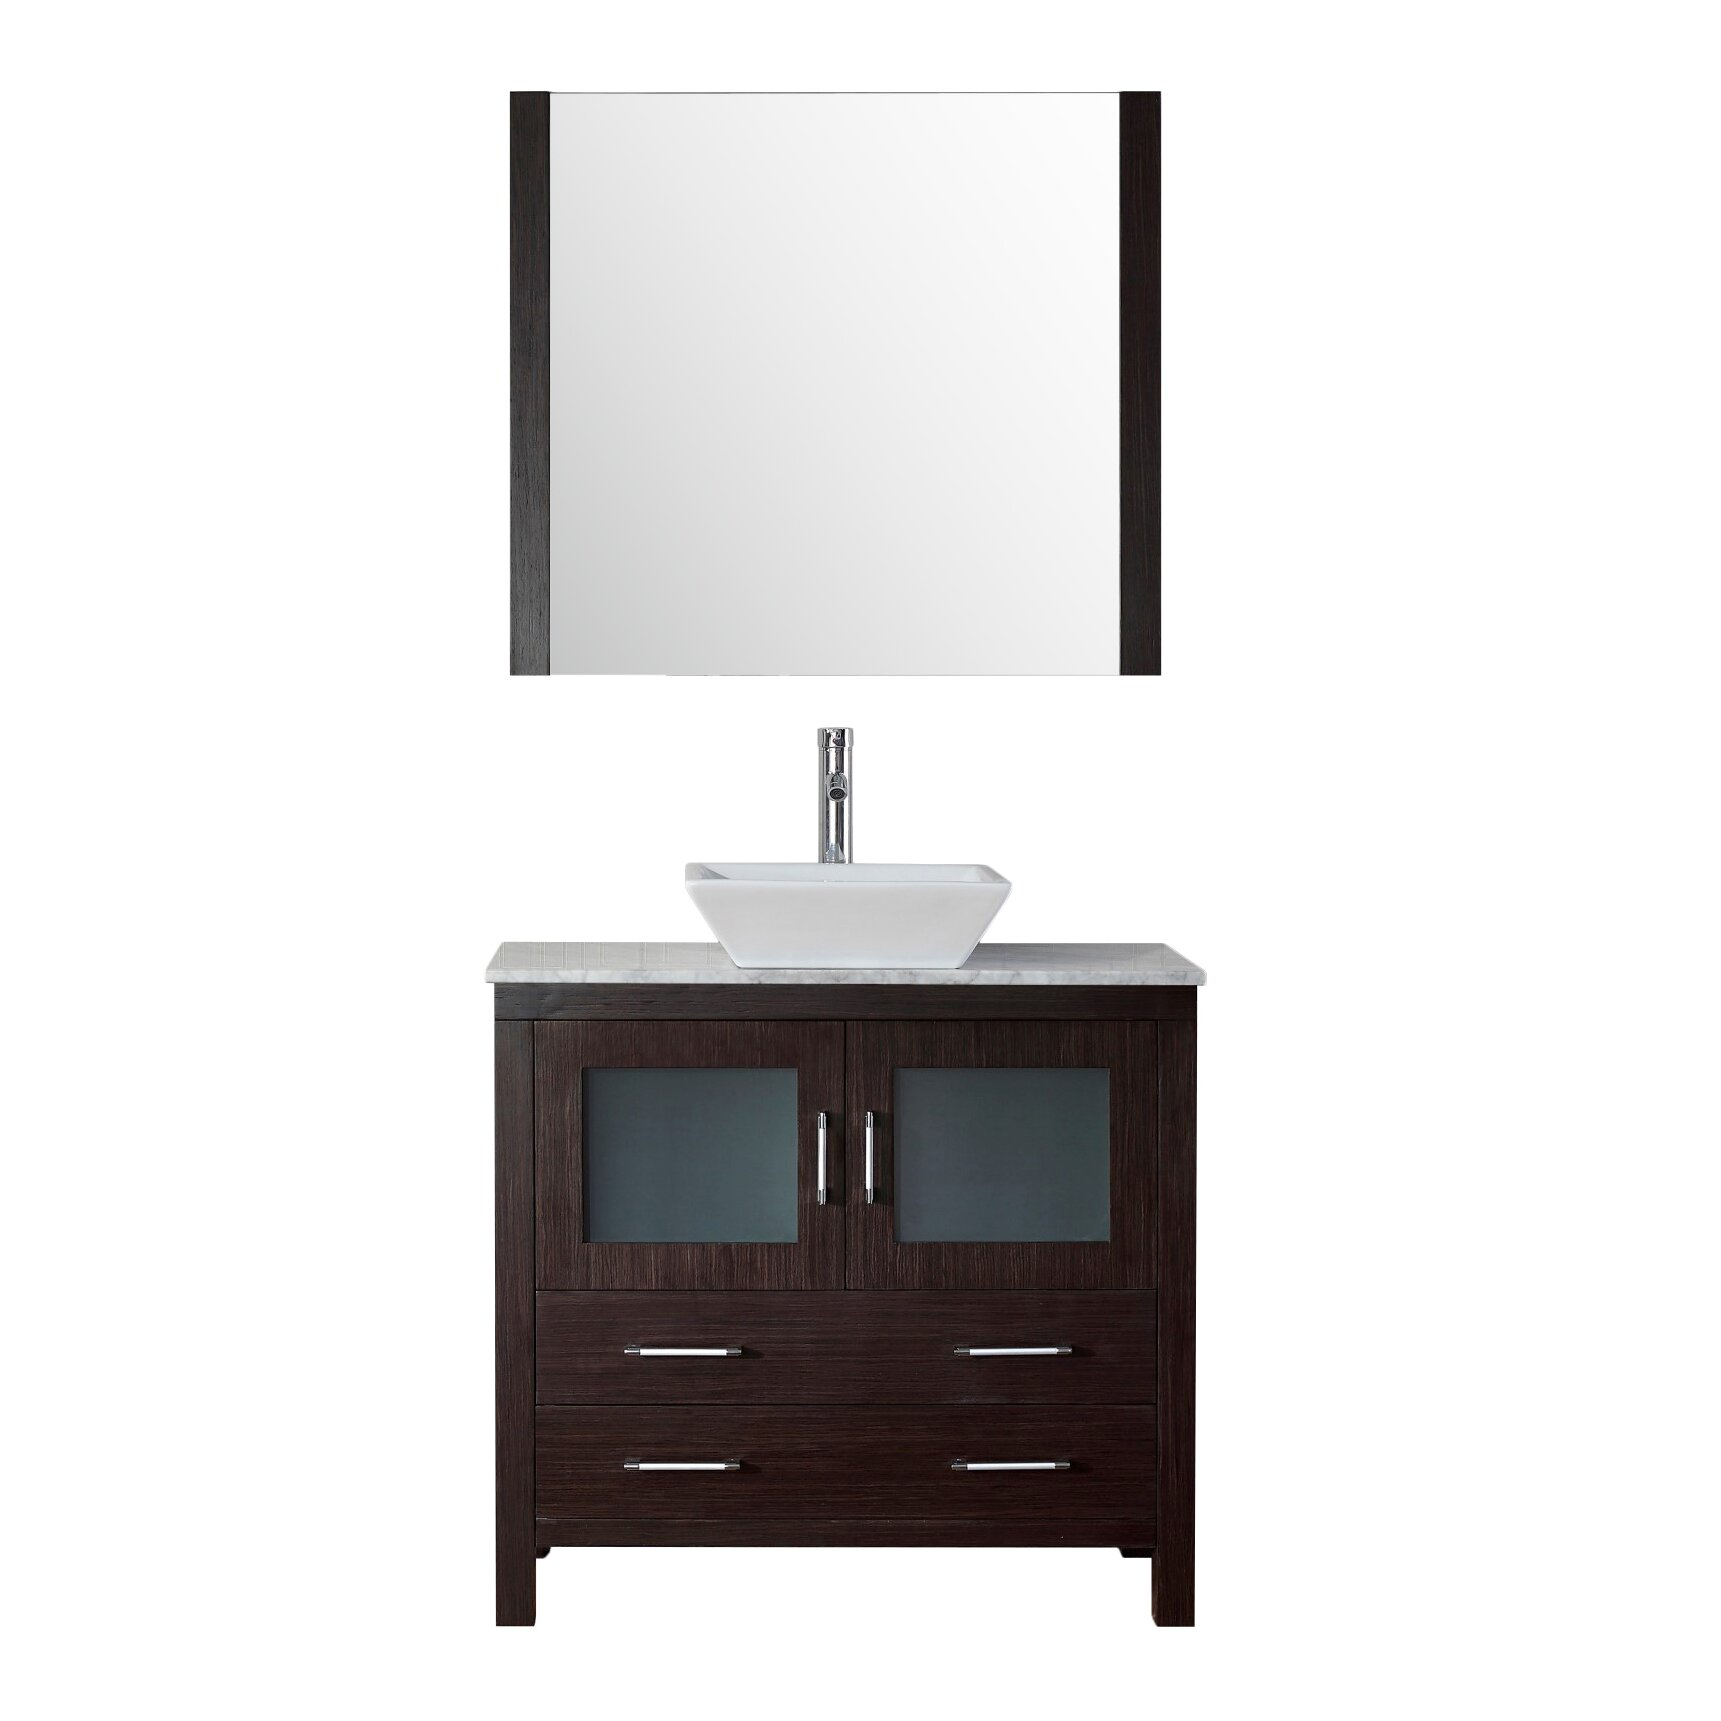 "Virtu Dior 32"" Single Bathroom Vanity Set with Mirror and Marble Top &am"